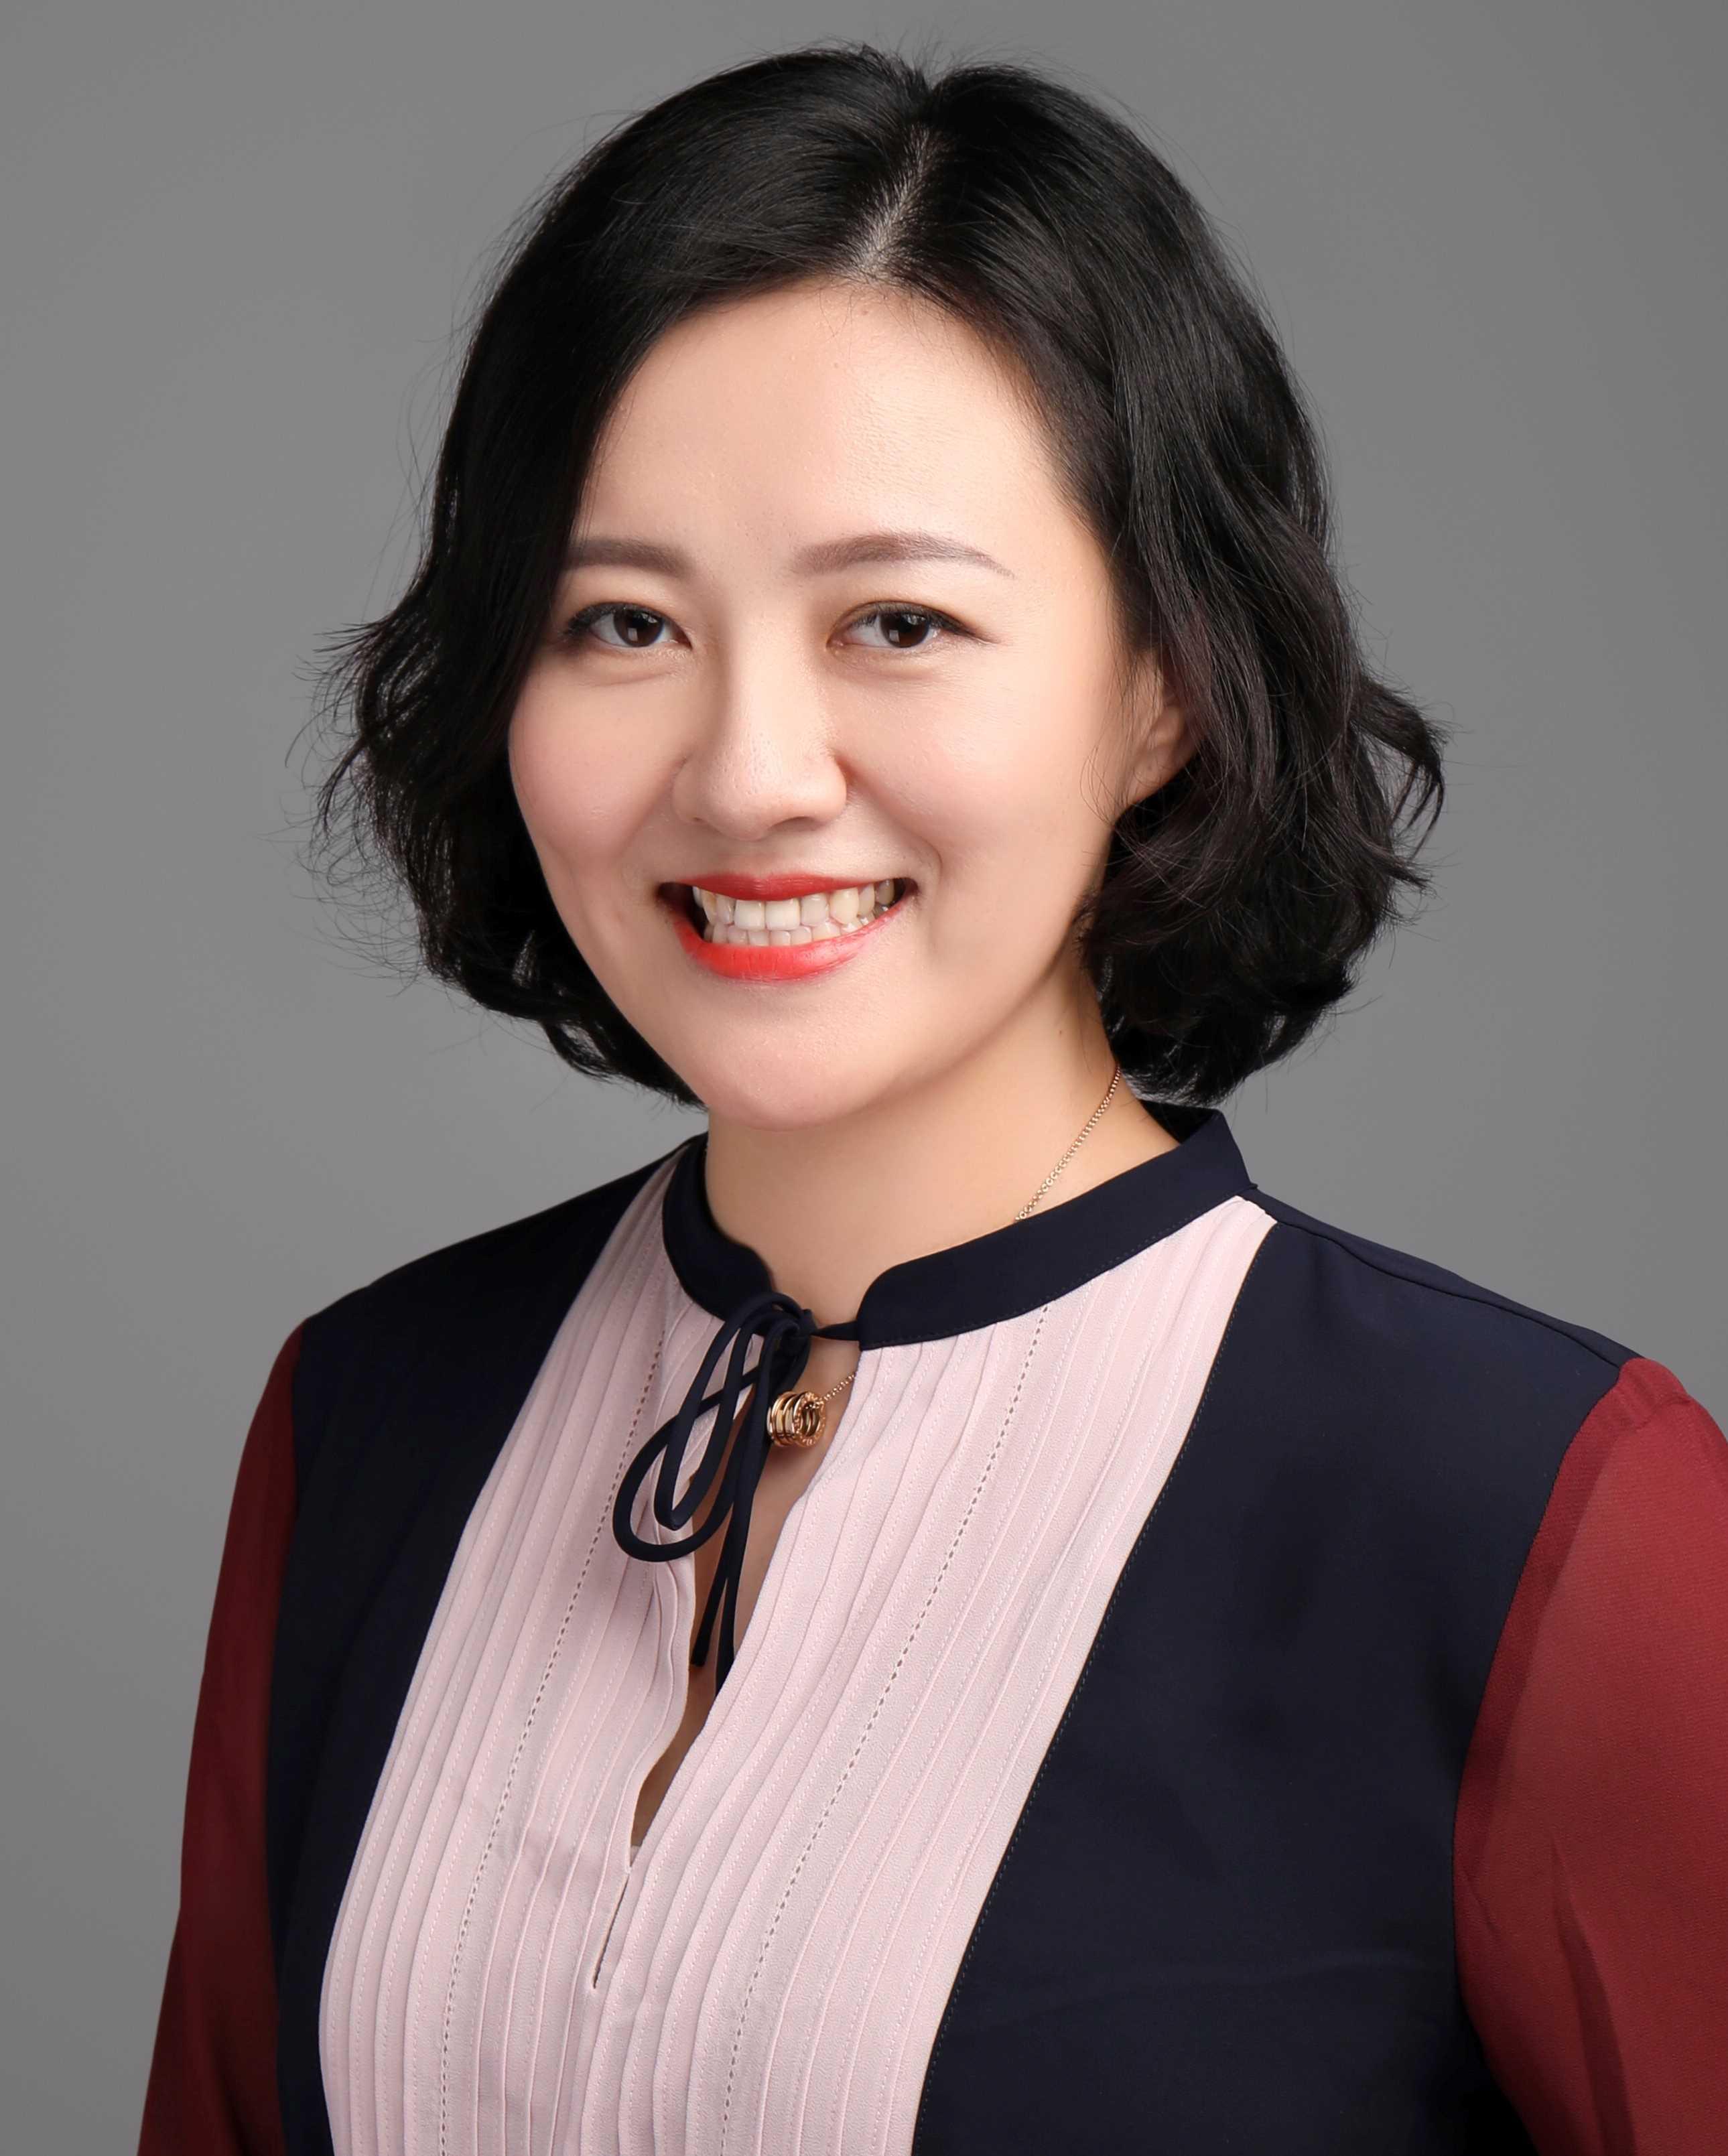 Stephanie Chui